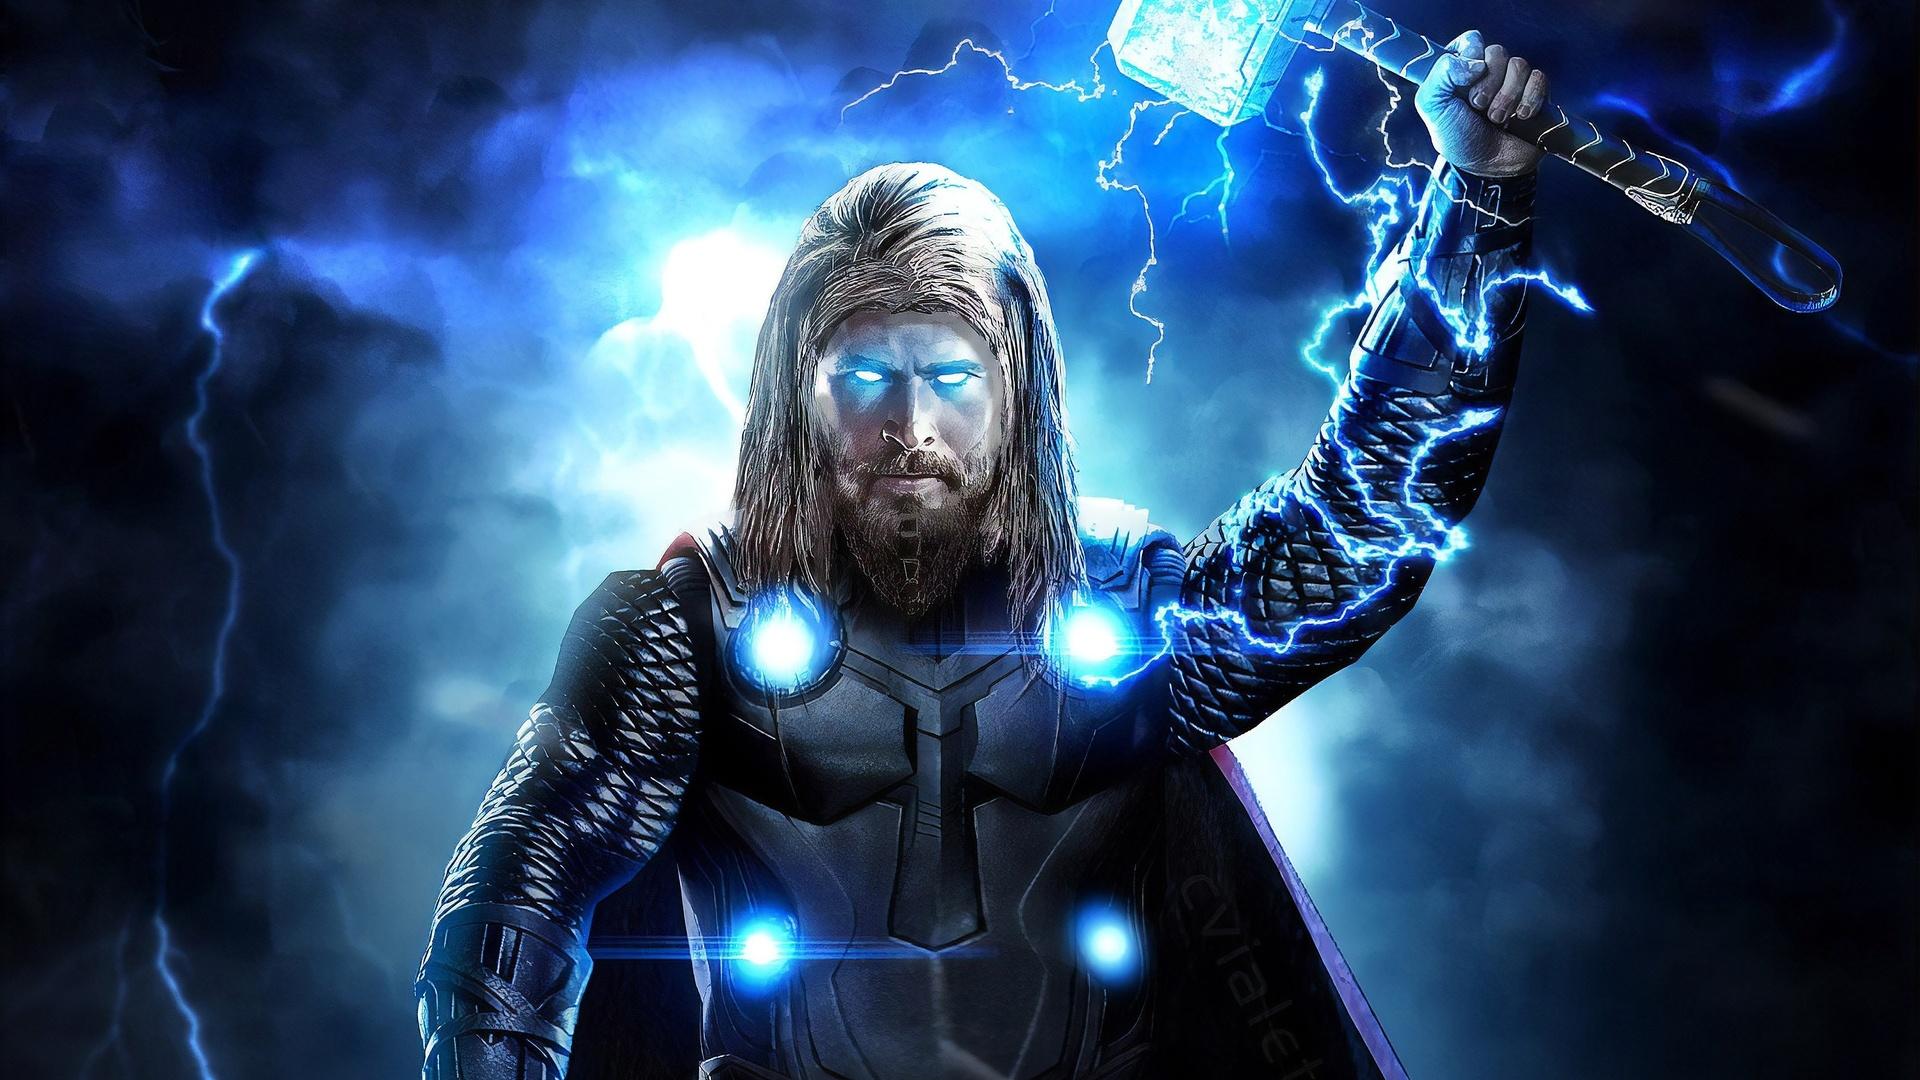 Thor free image